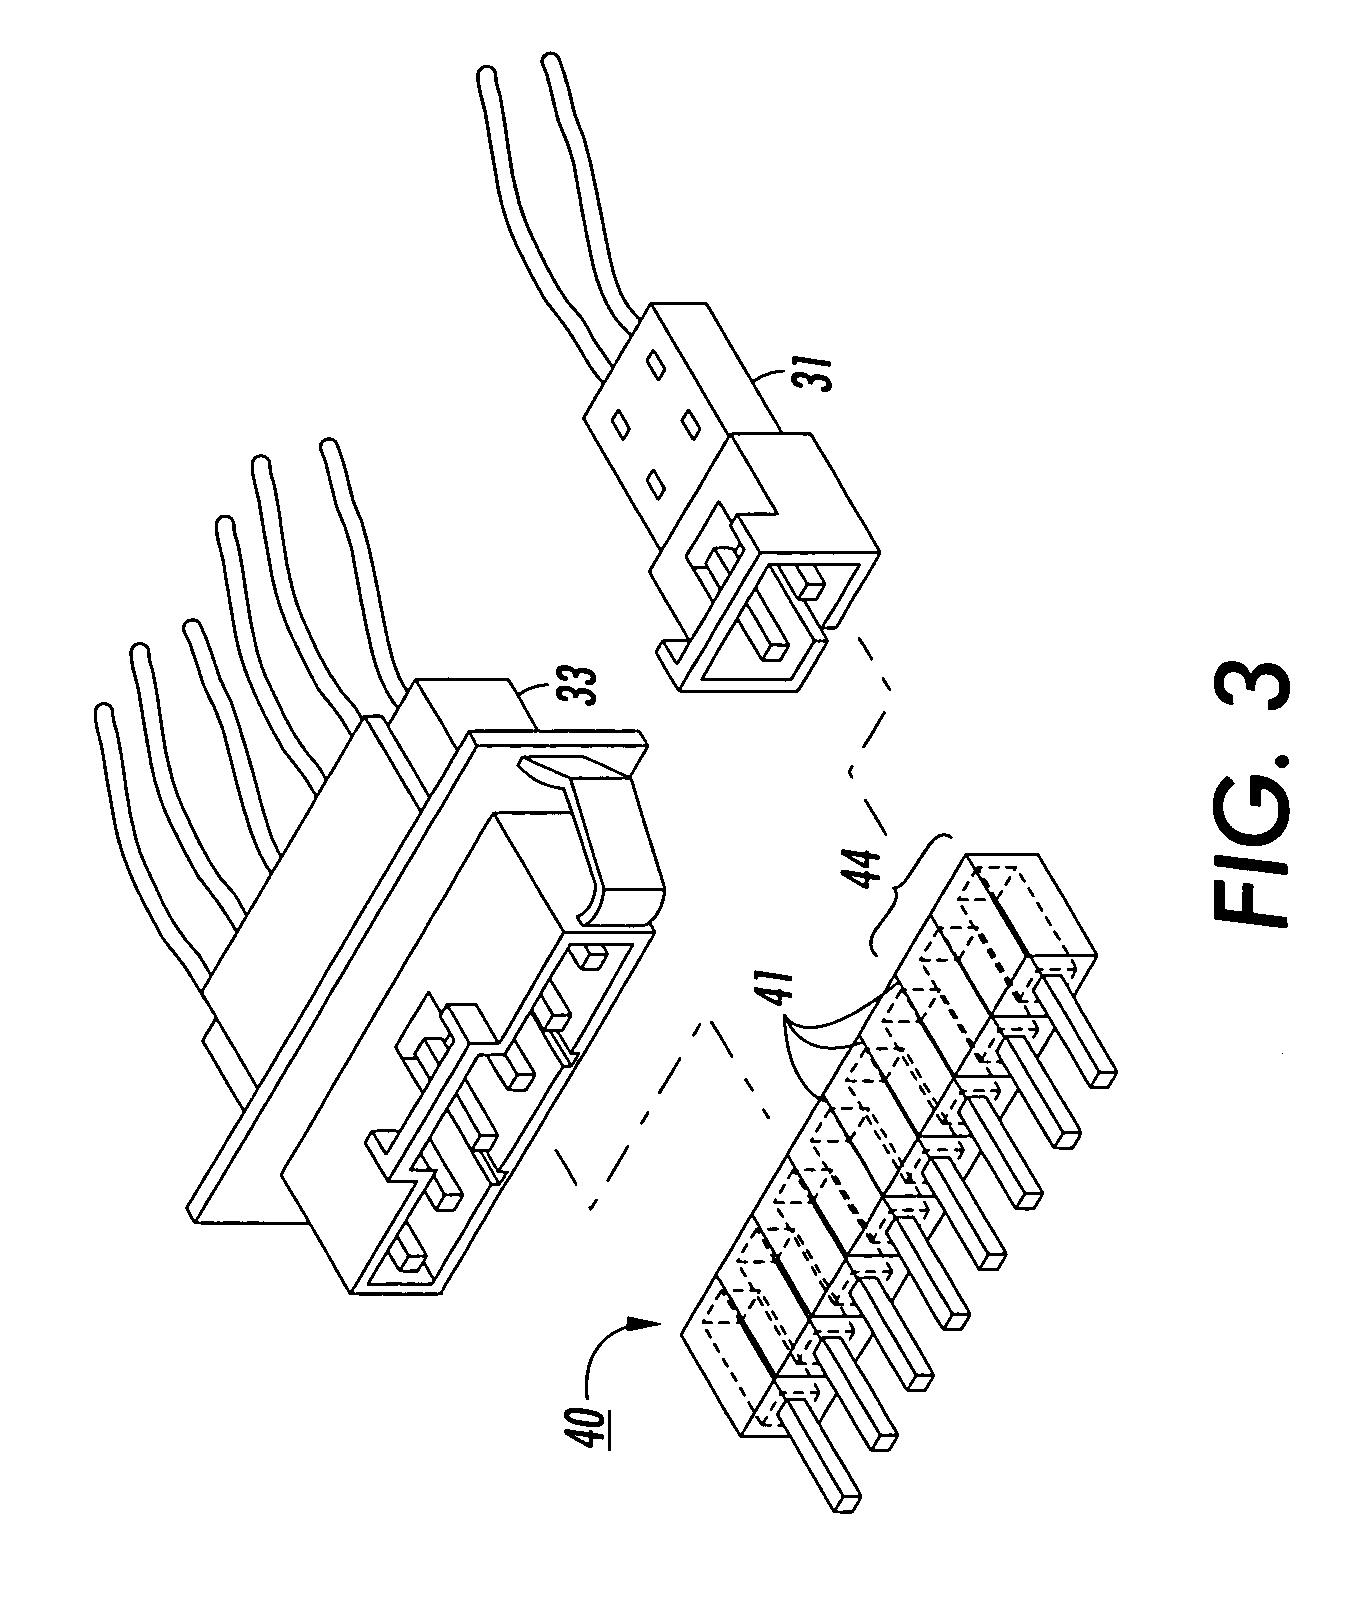 Patent Us6945822 Sacrificial Circuit Connector For